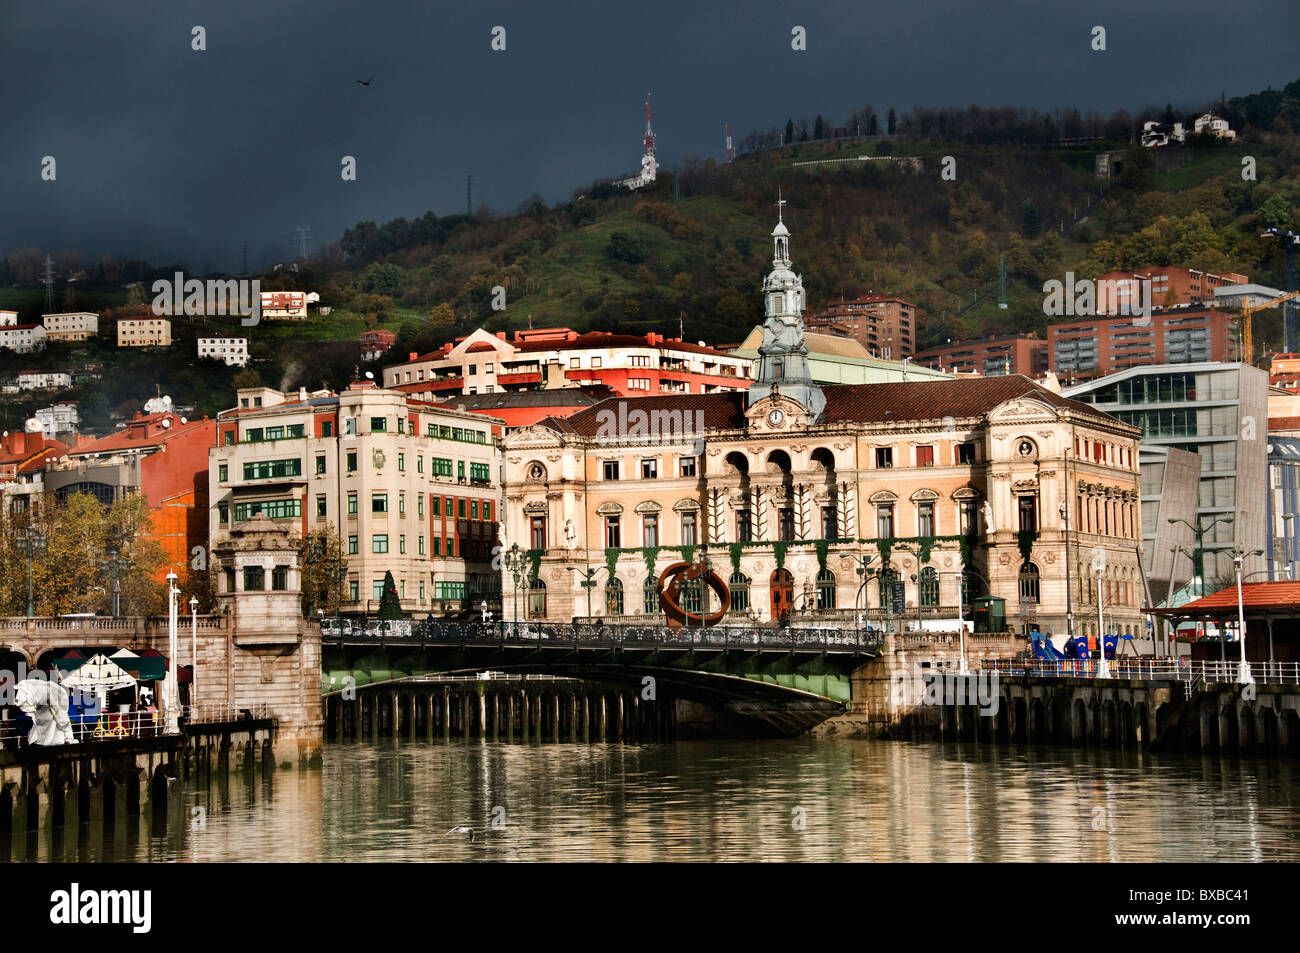 Bilbao Spain Spanish Basque Country - Stock Image